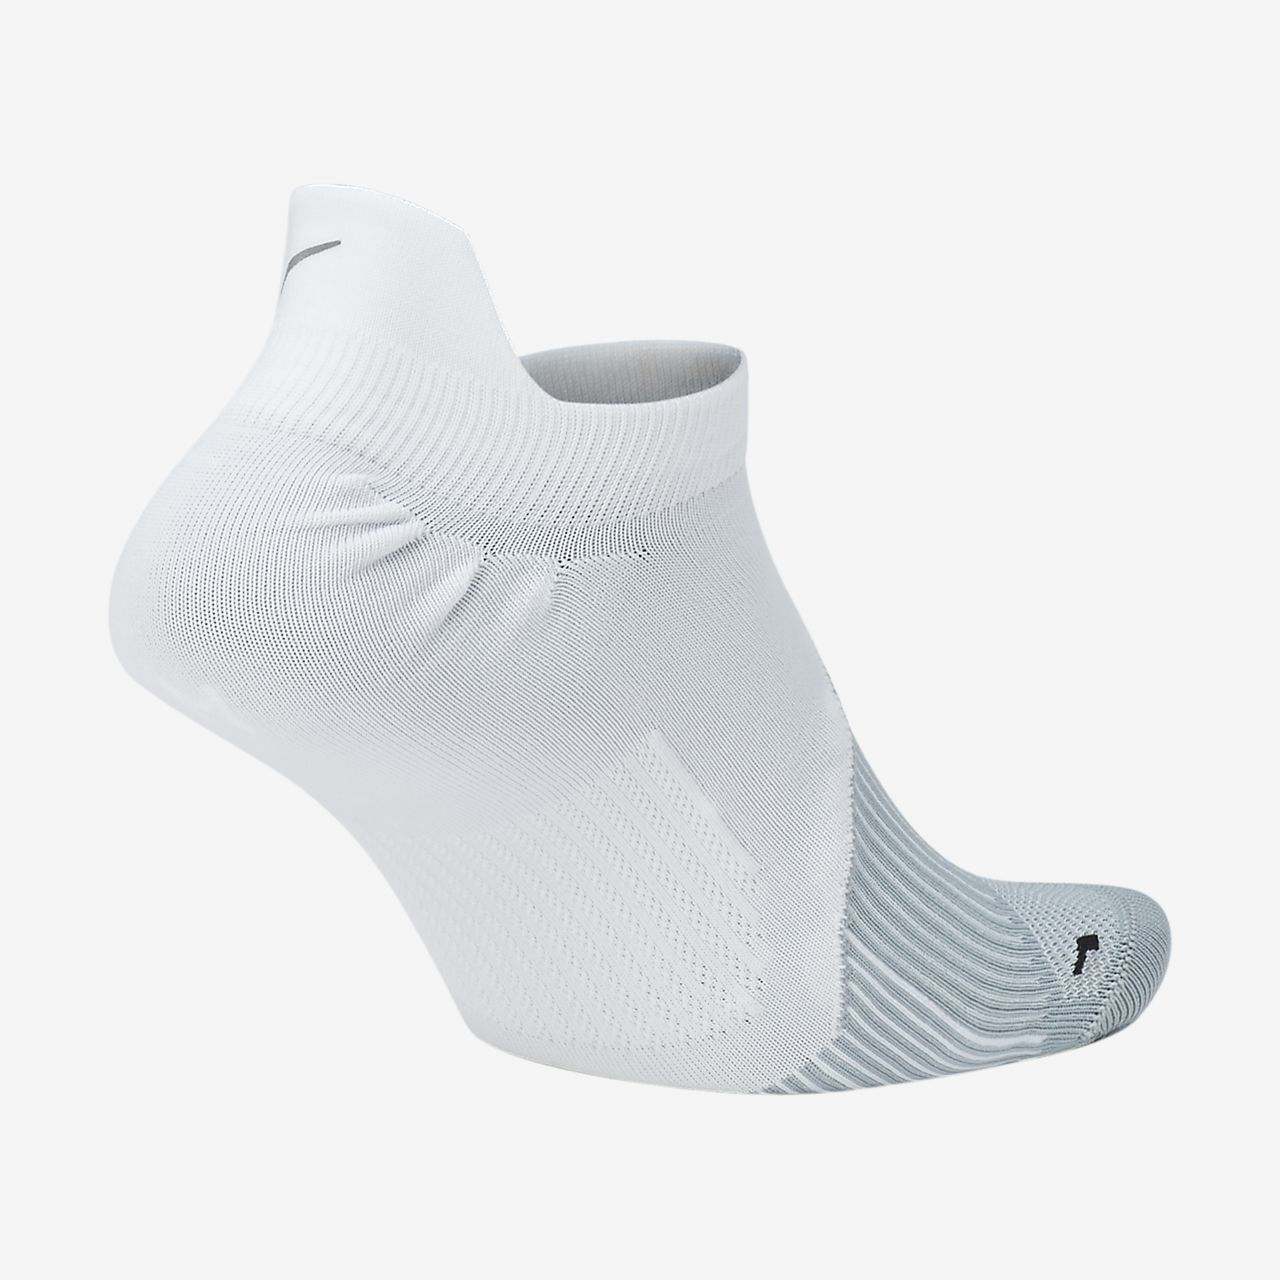 Nike Elite Lightweight No-Show Hardloopsokken